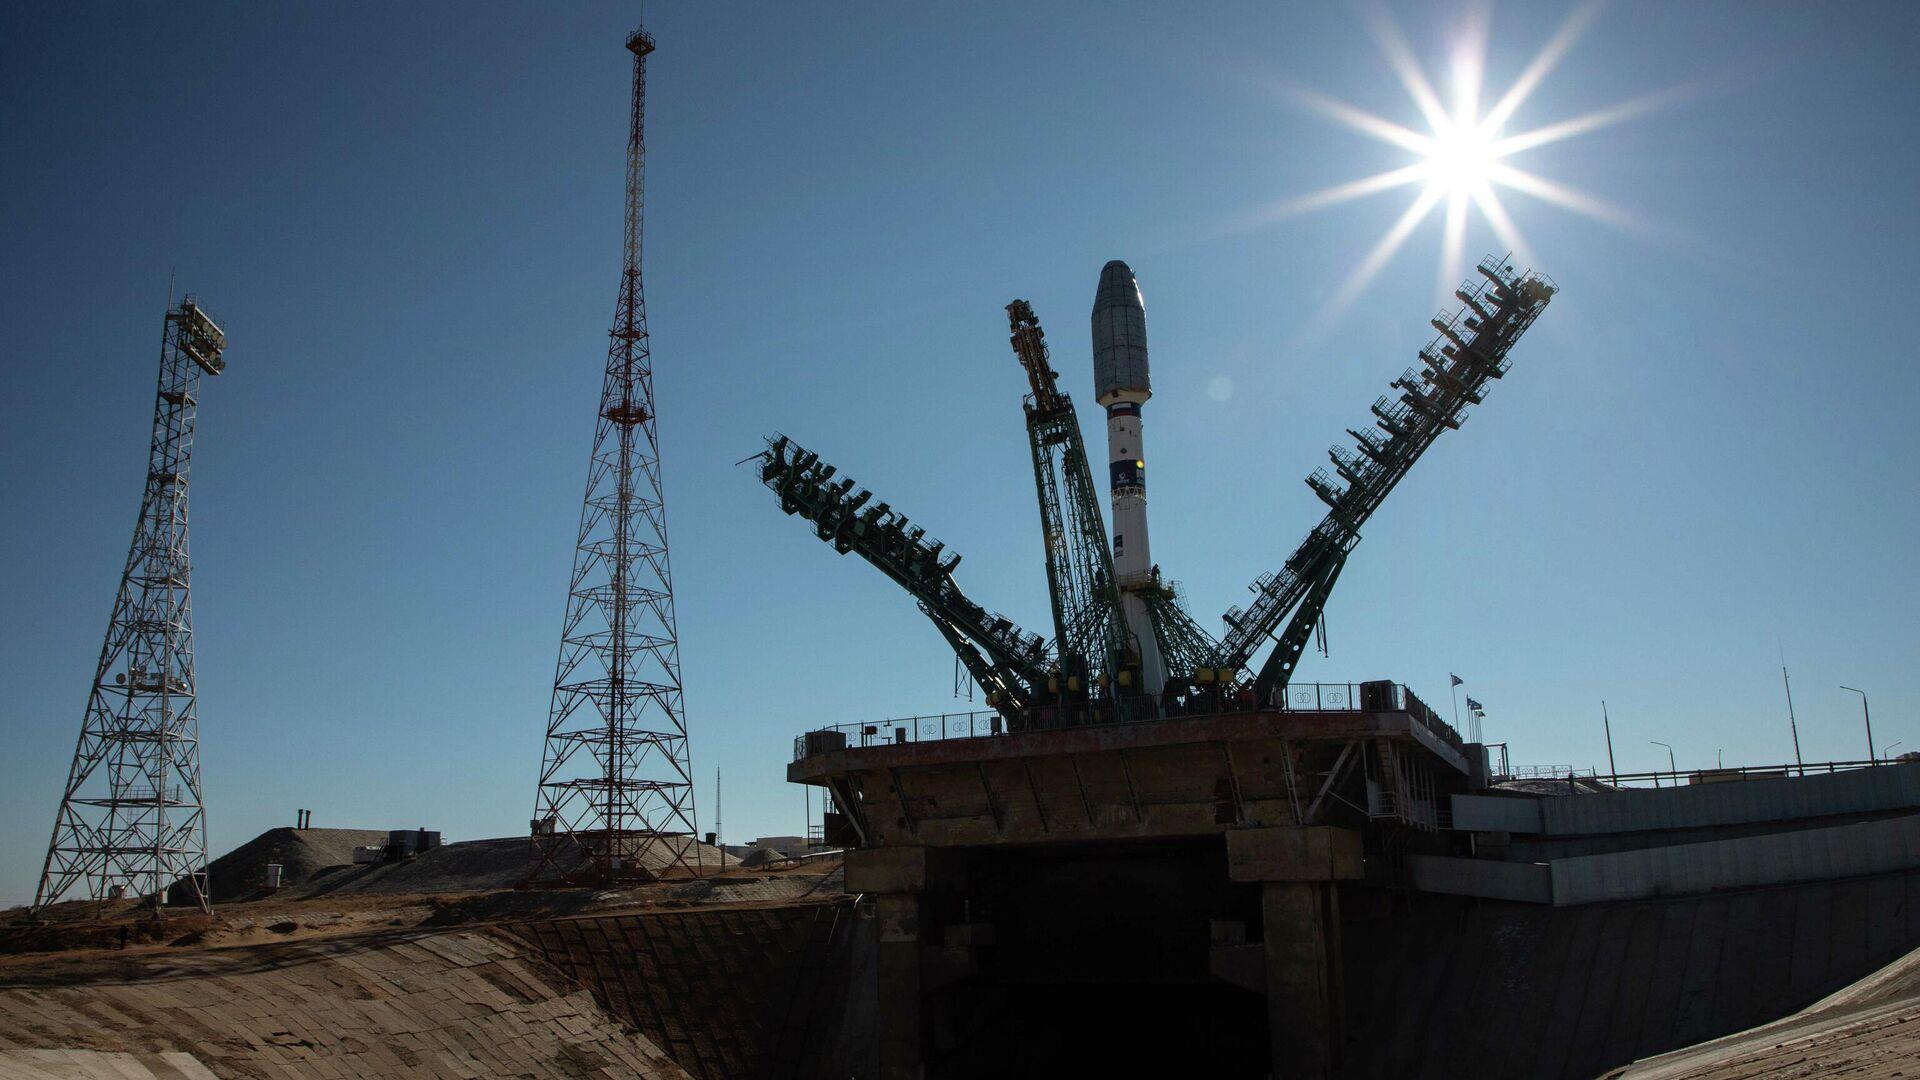 La agencia espacial rusa Roscosmos pone en órbita 38 satélites de diferentes países - Sputnik Mundo, 1920, 22.03.2021